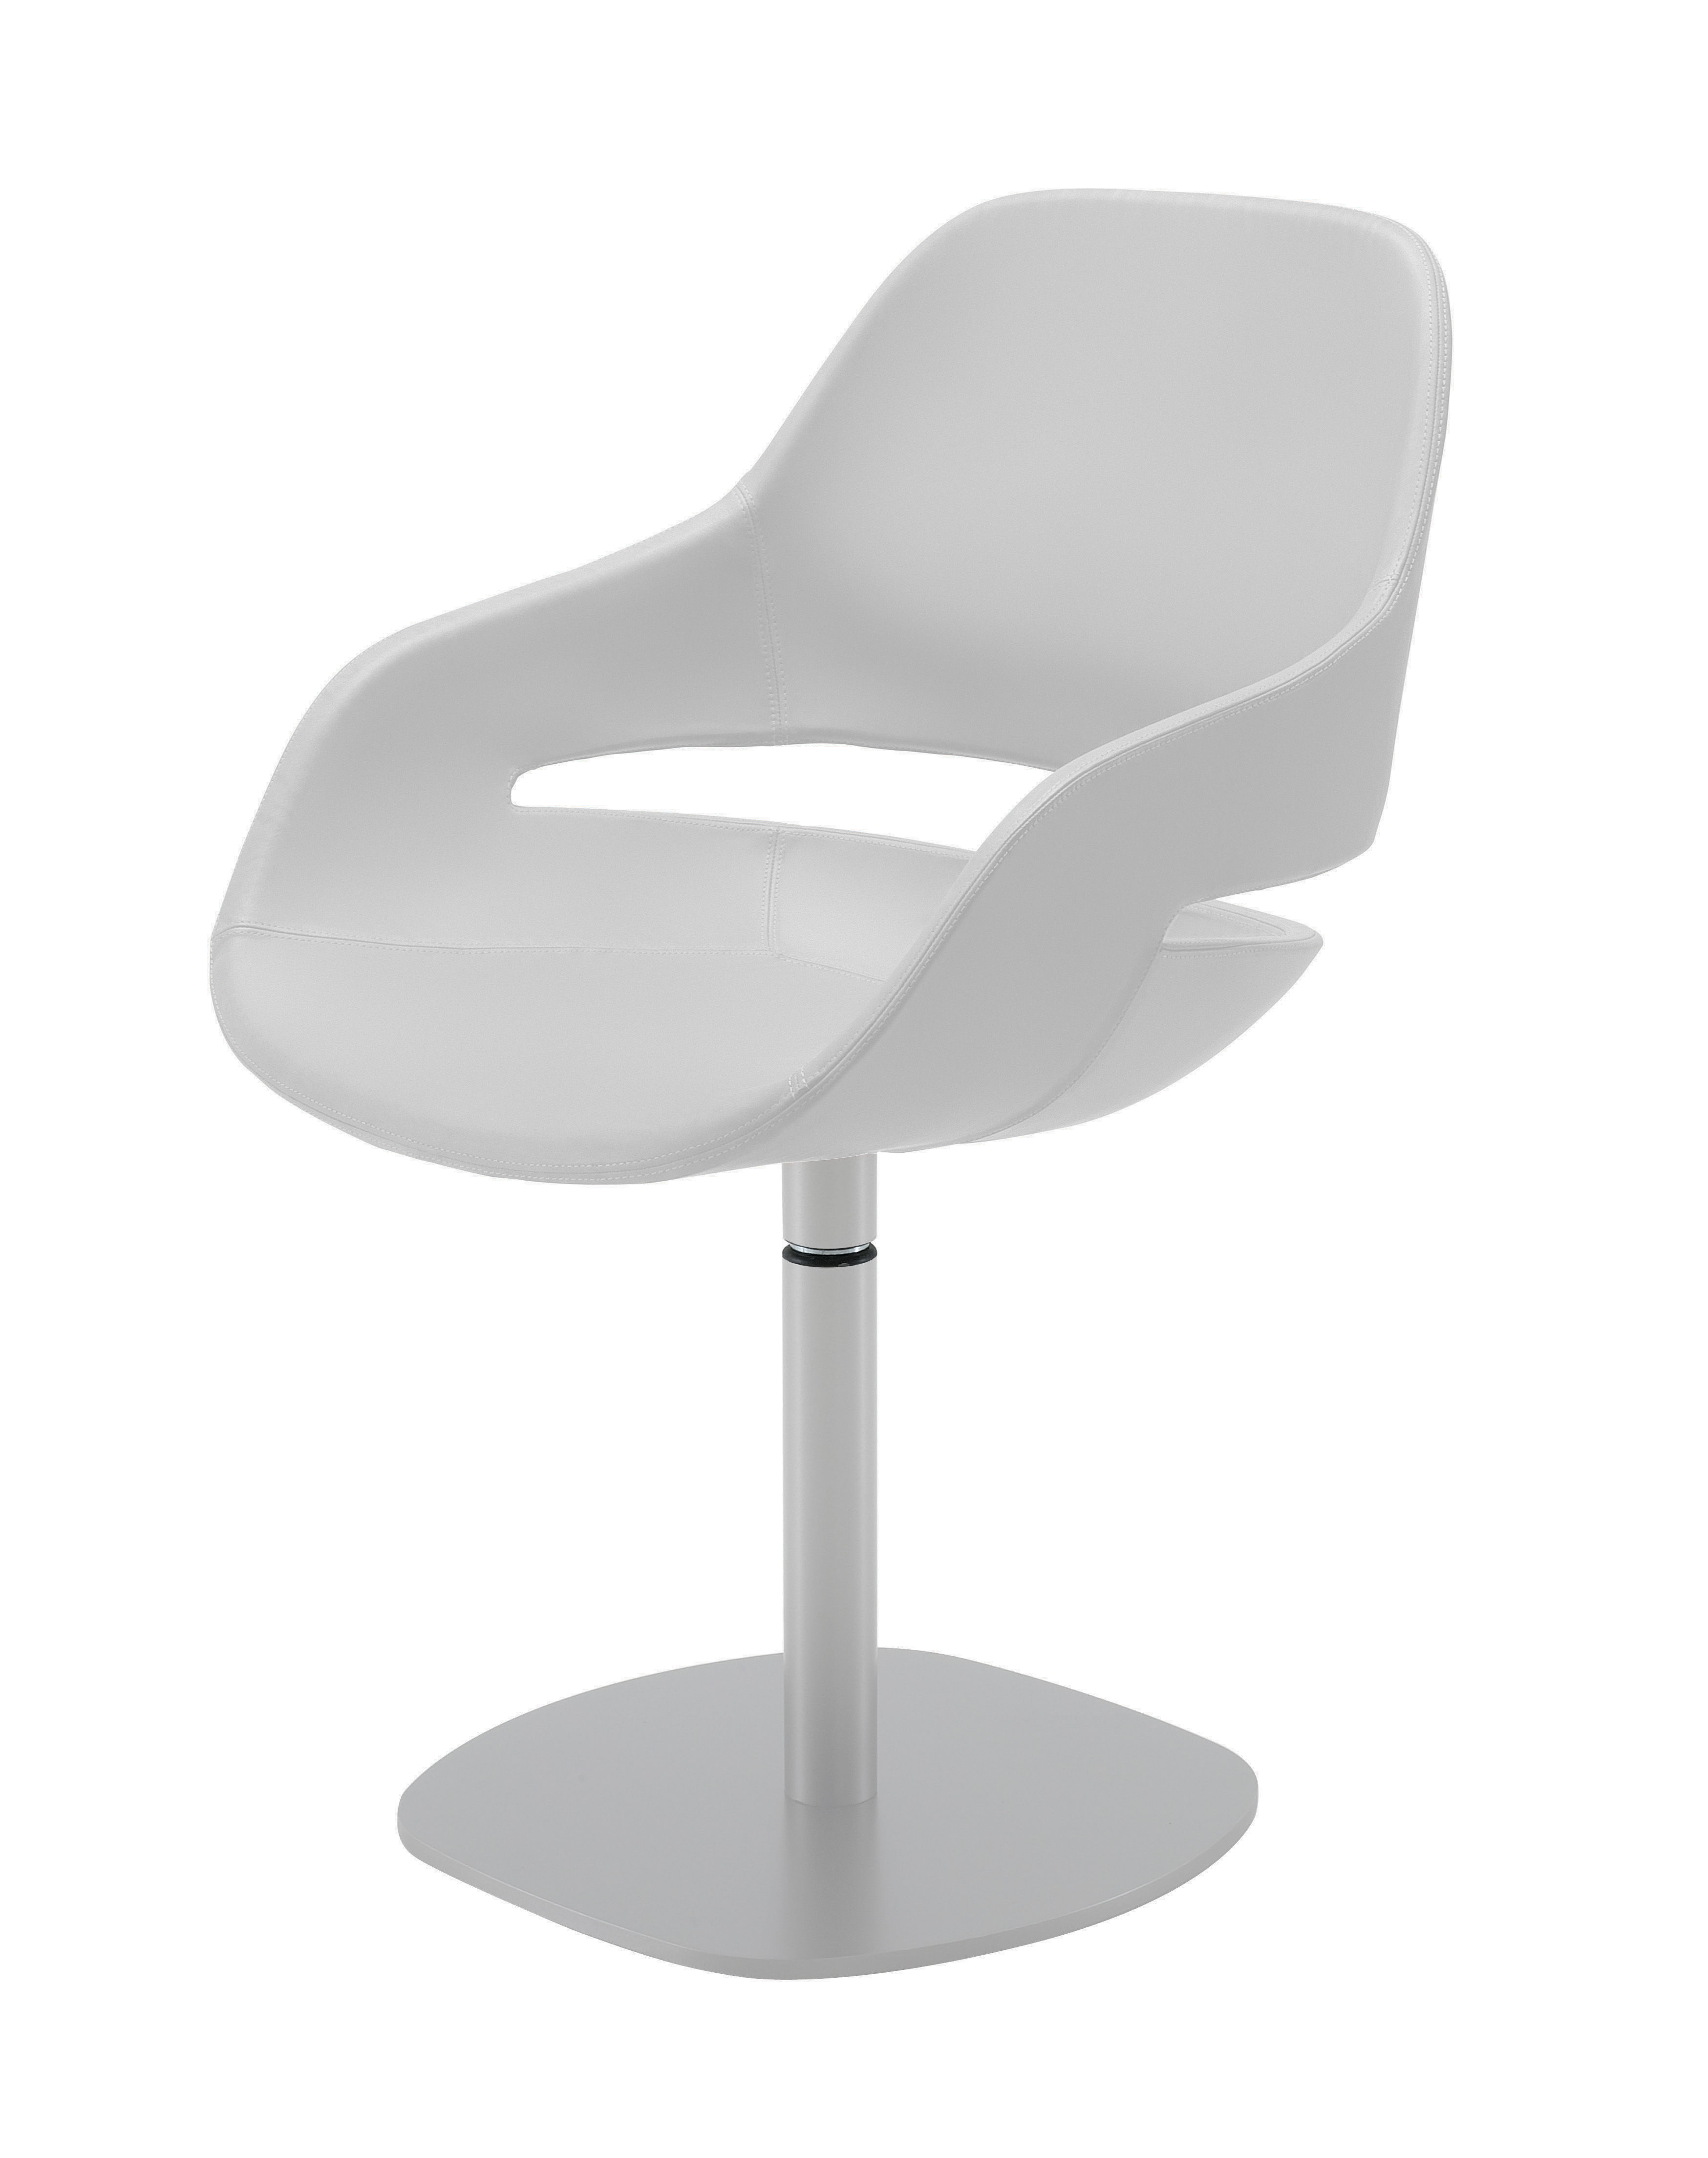 fauteuil pivotant eva coque polyur thane pied m tal pied blanc coque blanche zanotta. Black Bedroom Furniture Sets. Home Design Ideas